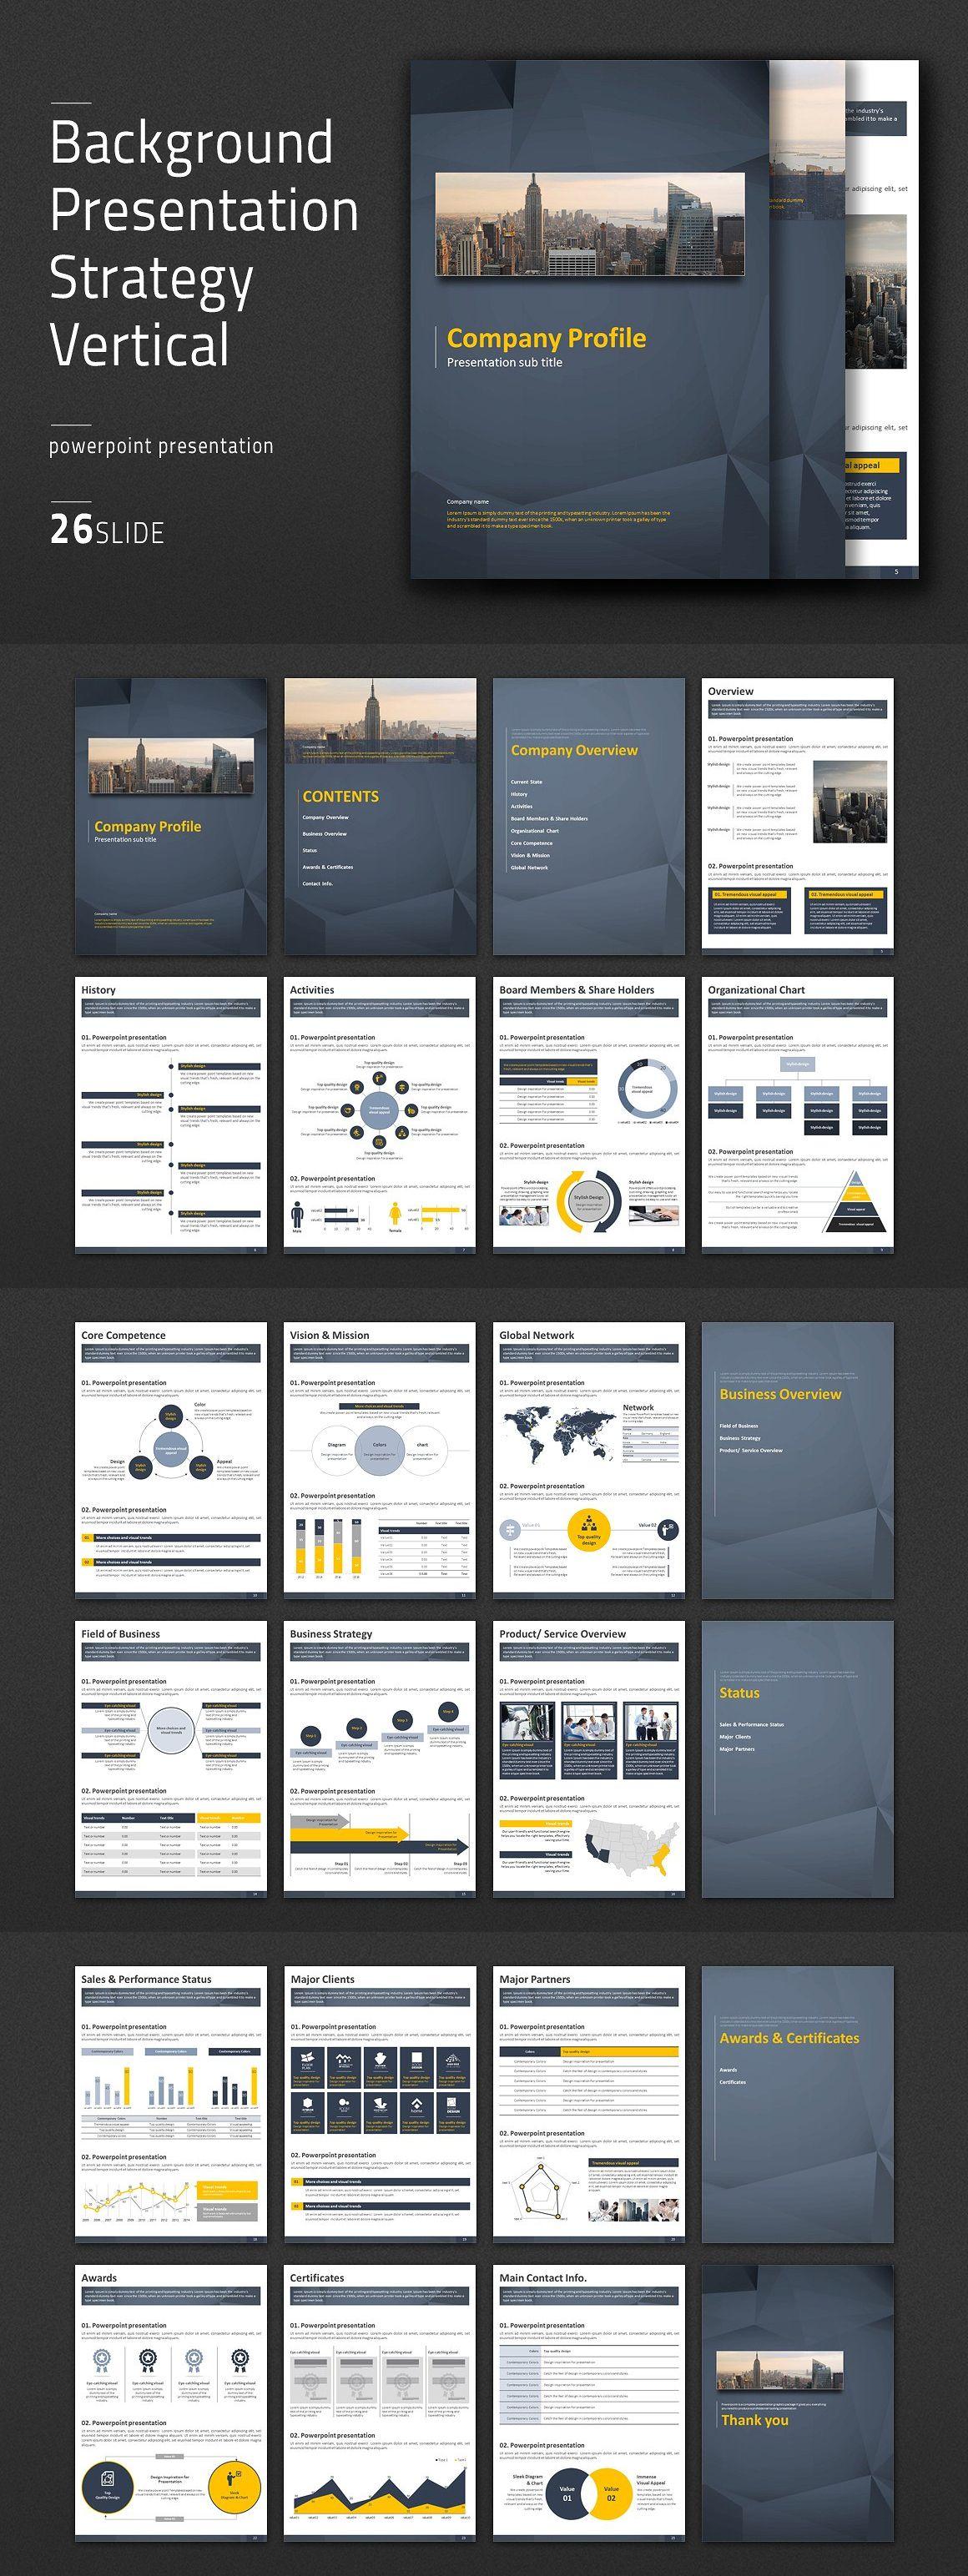 Background Presentation Strategy Template PDF   Presentation